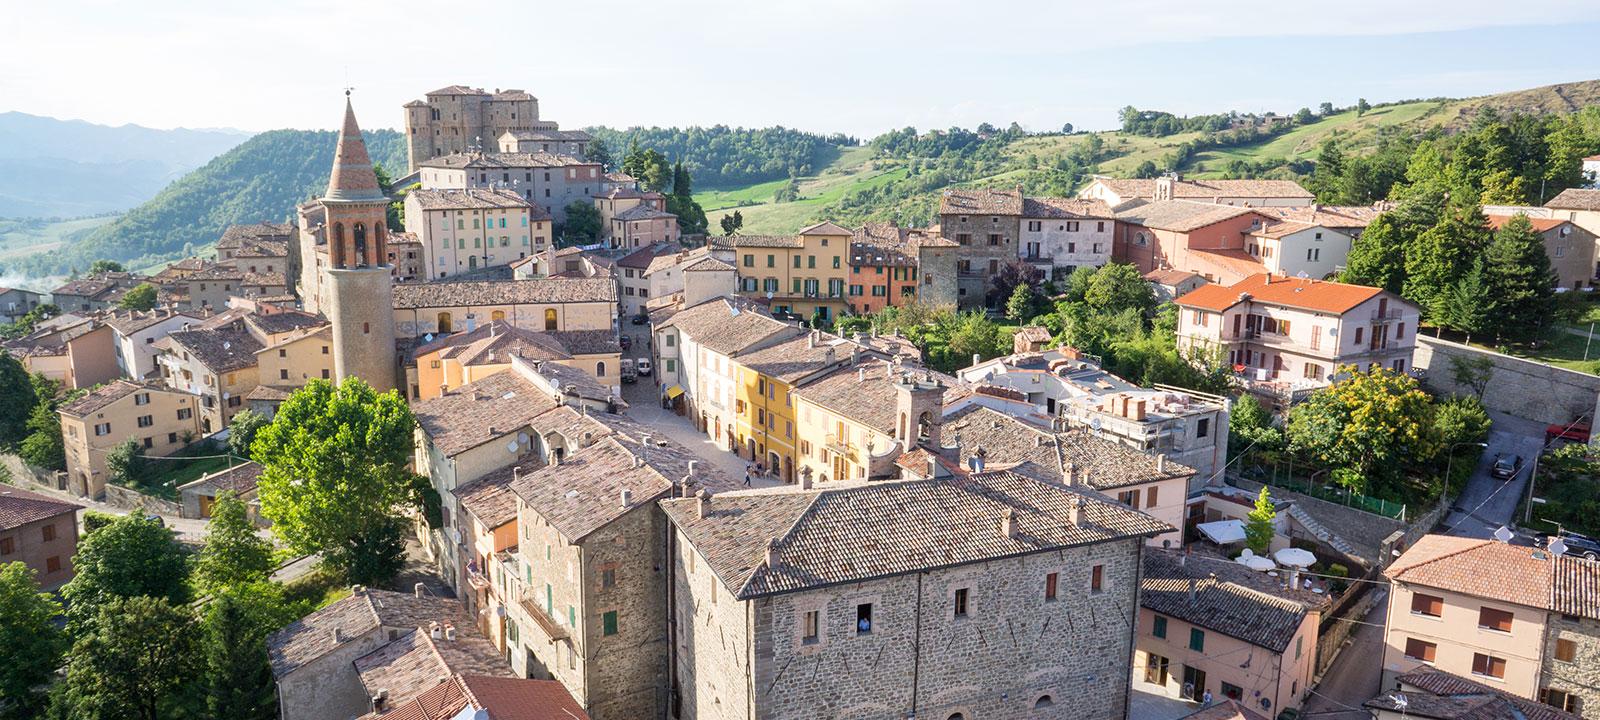 Sant'Agata Feltria (Cammino di San Francesco da Rimini a La Verna)